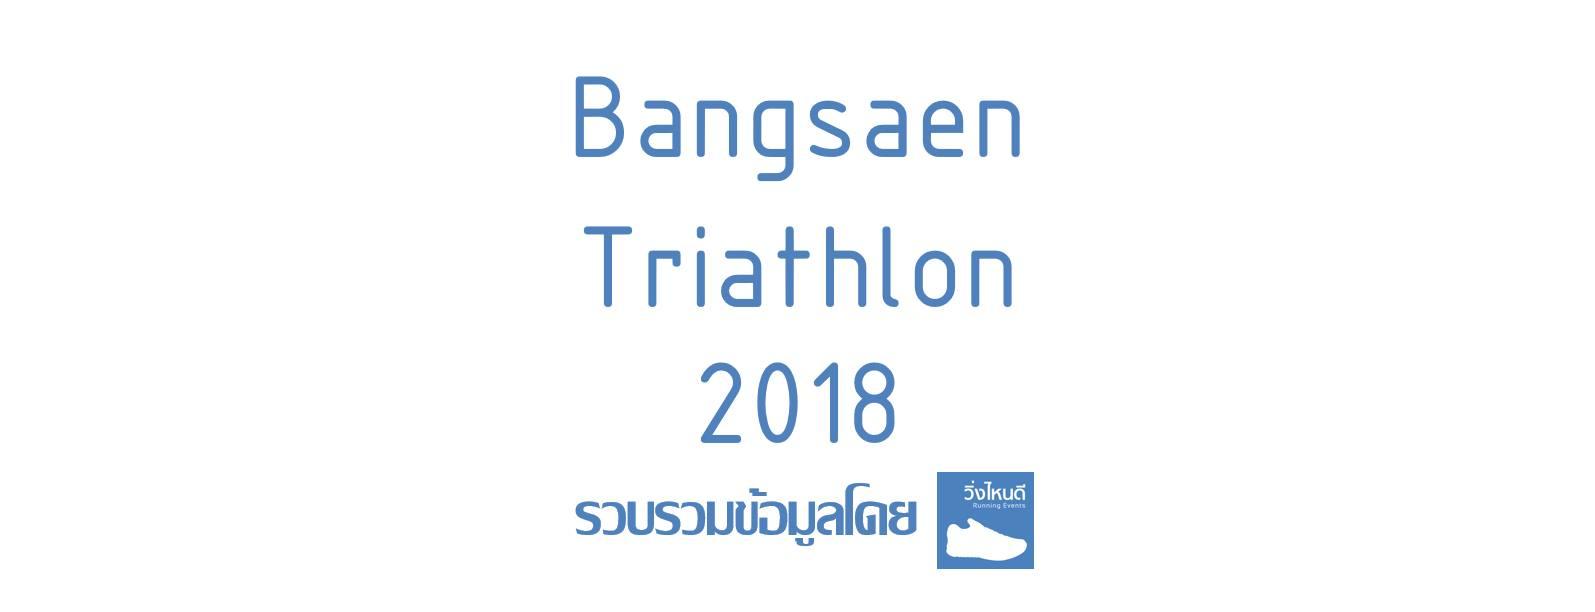 Bangsaen Triathlon 2018